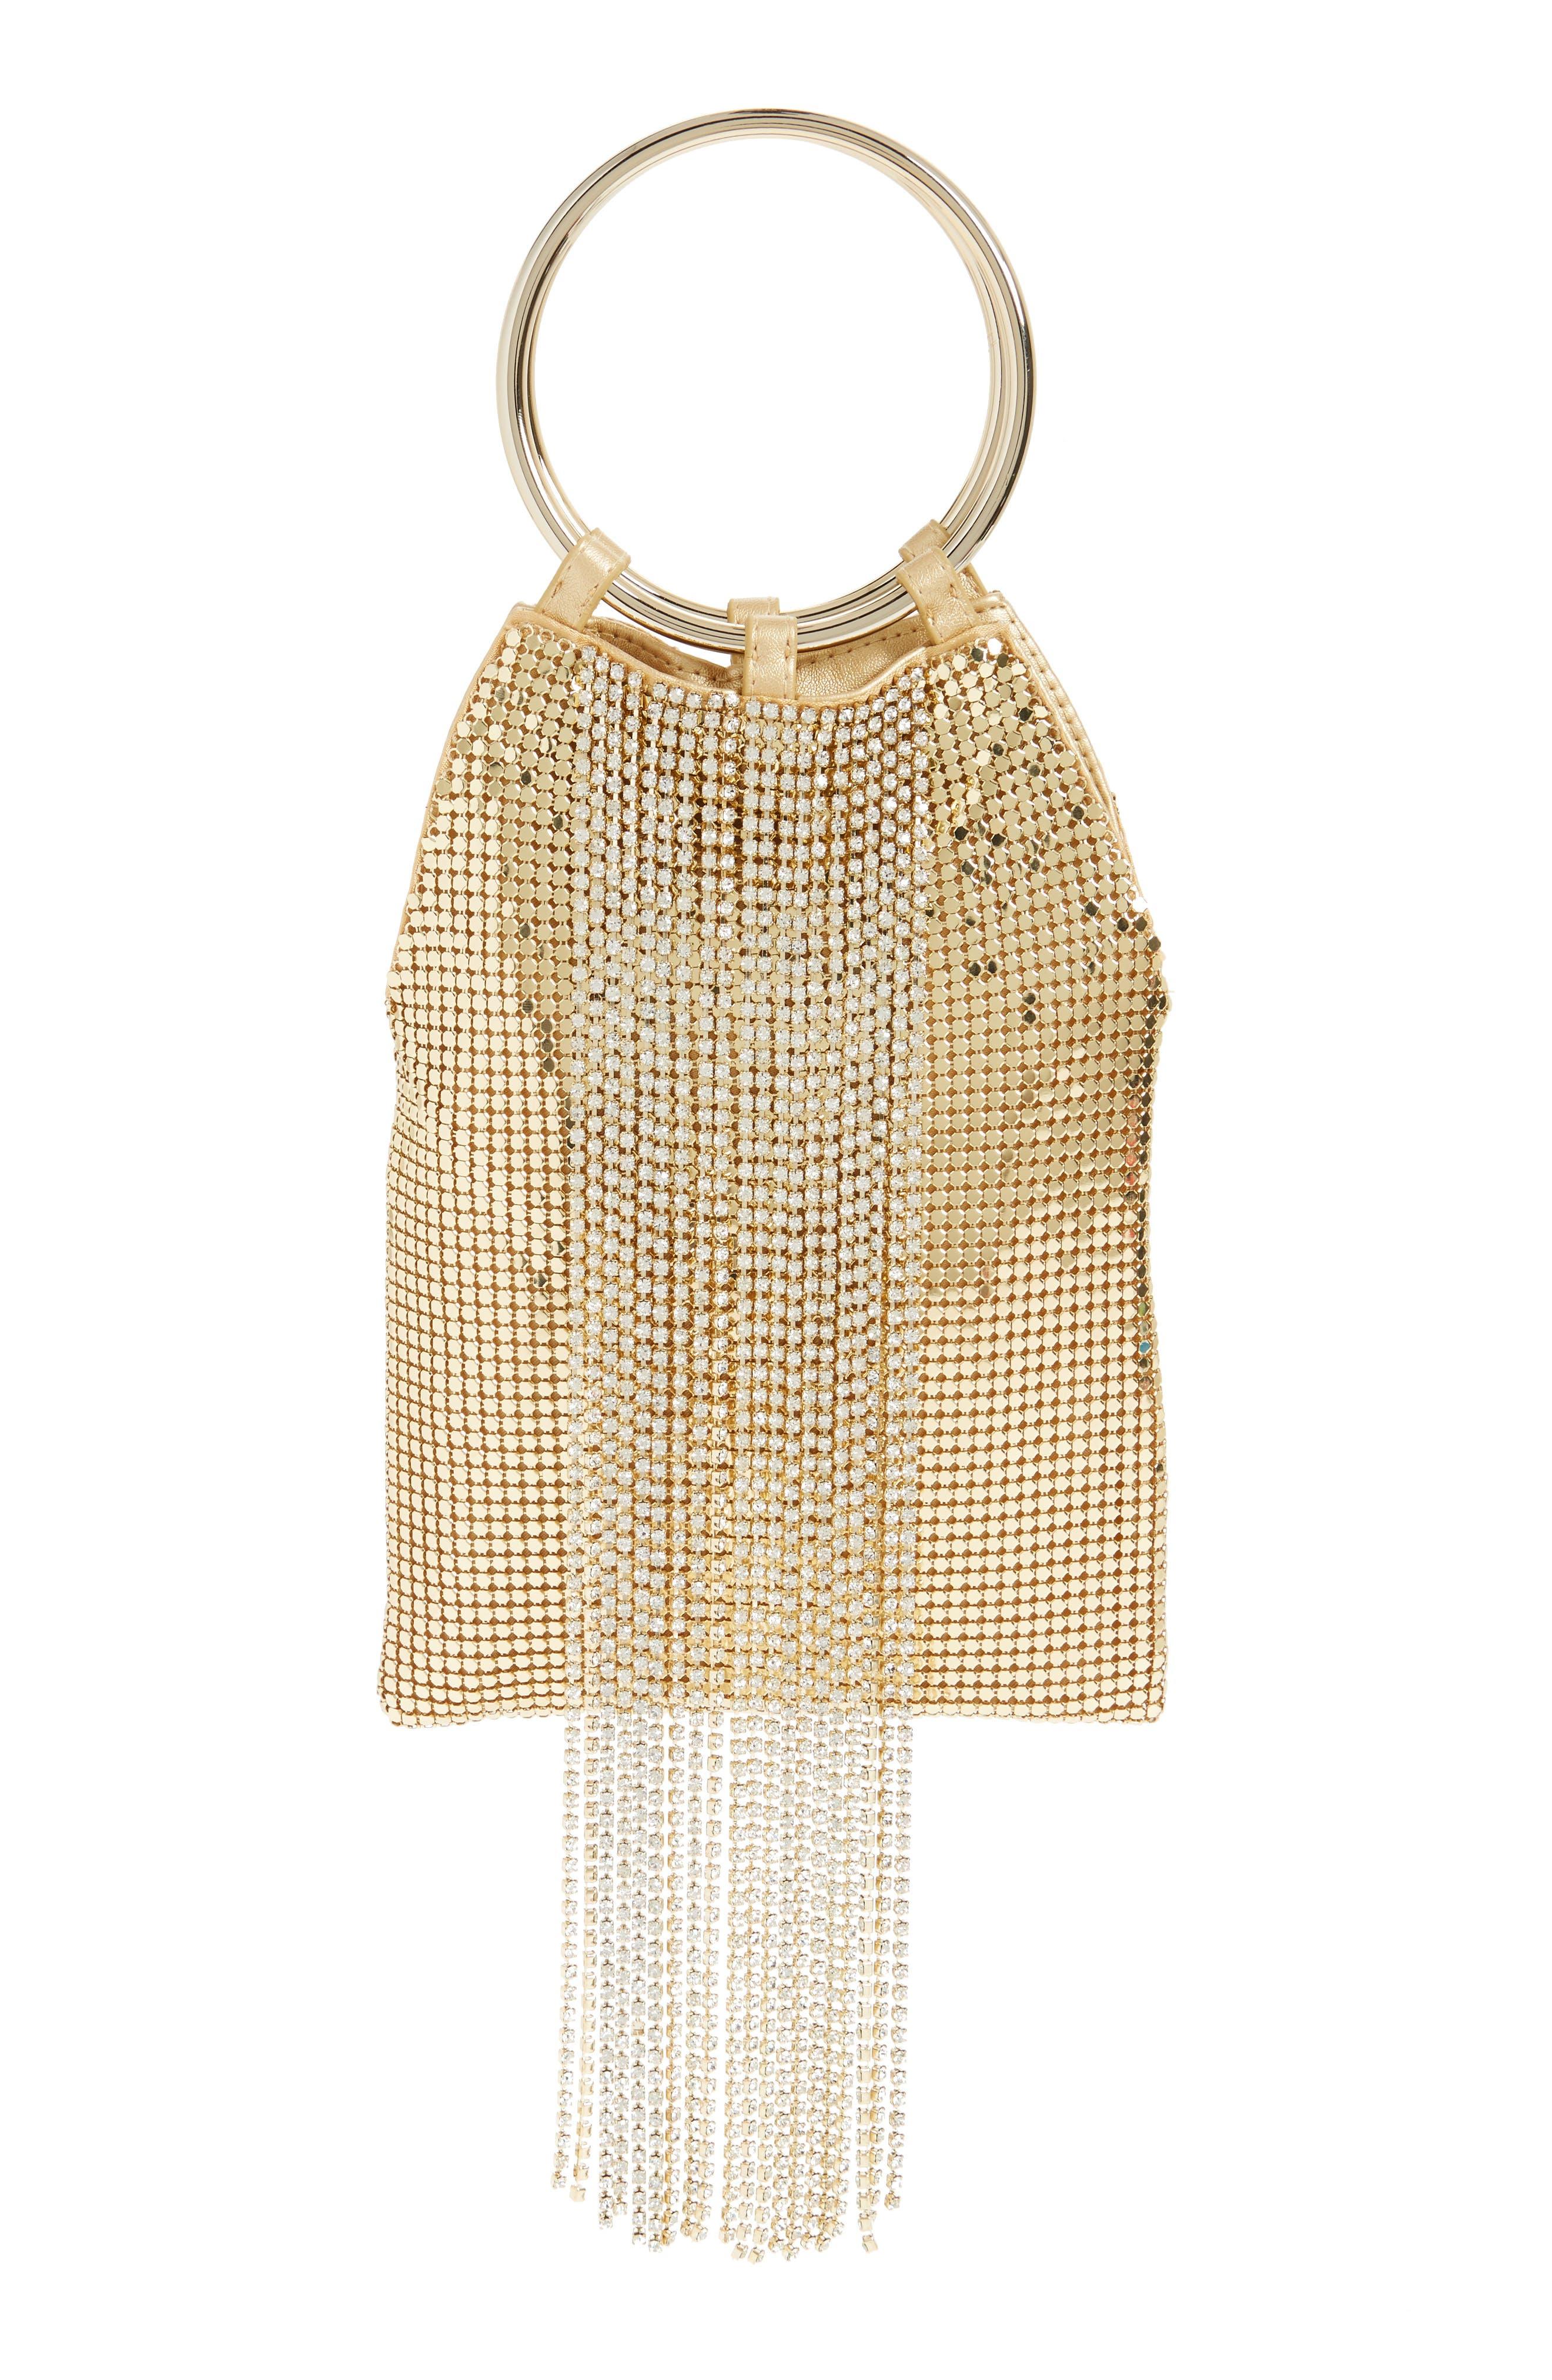 Alternate Image 1 Selected - Whiting & Davis Cascade Crystal Fringe Mesh Bracelet Bag